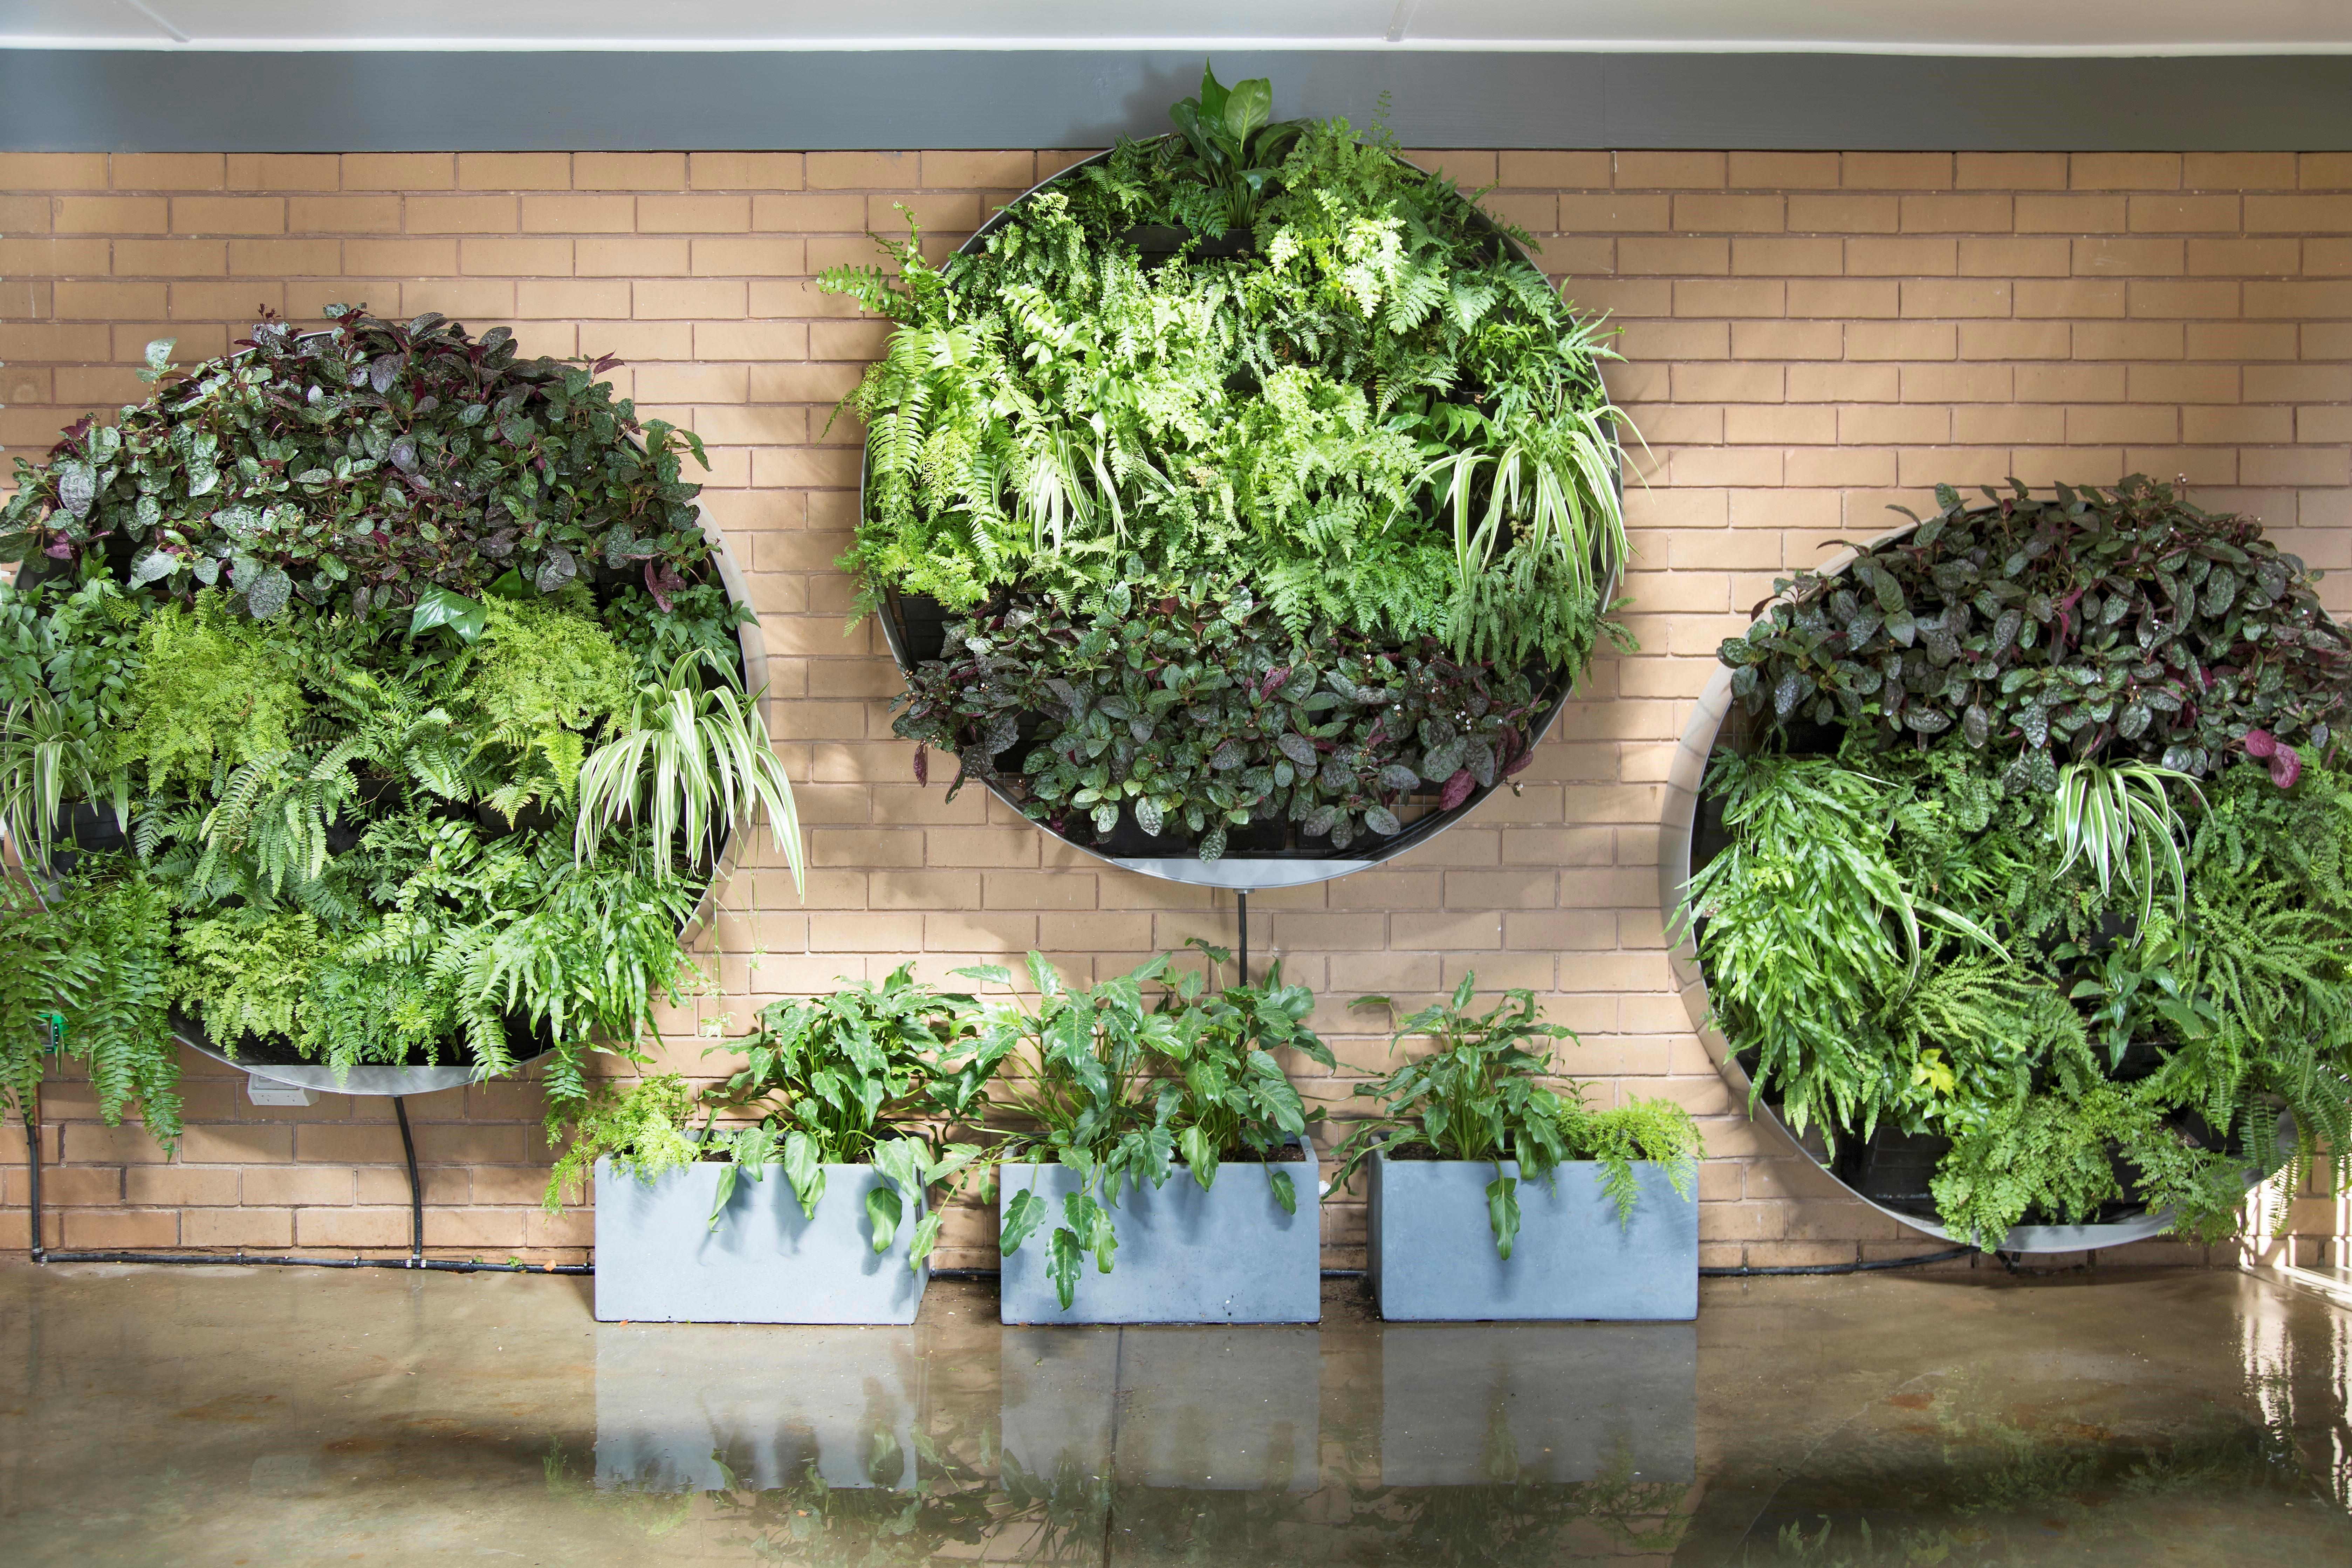 vertical garden vg 52 - as seen on buying blind NGOSWIU